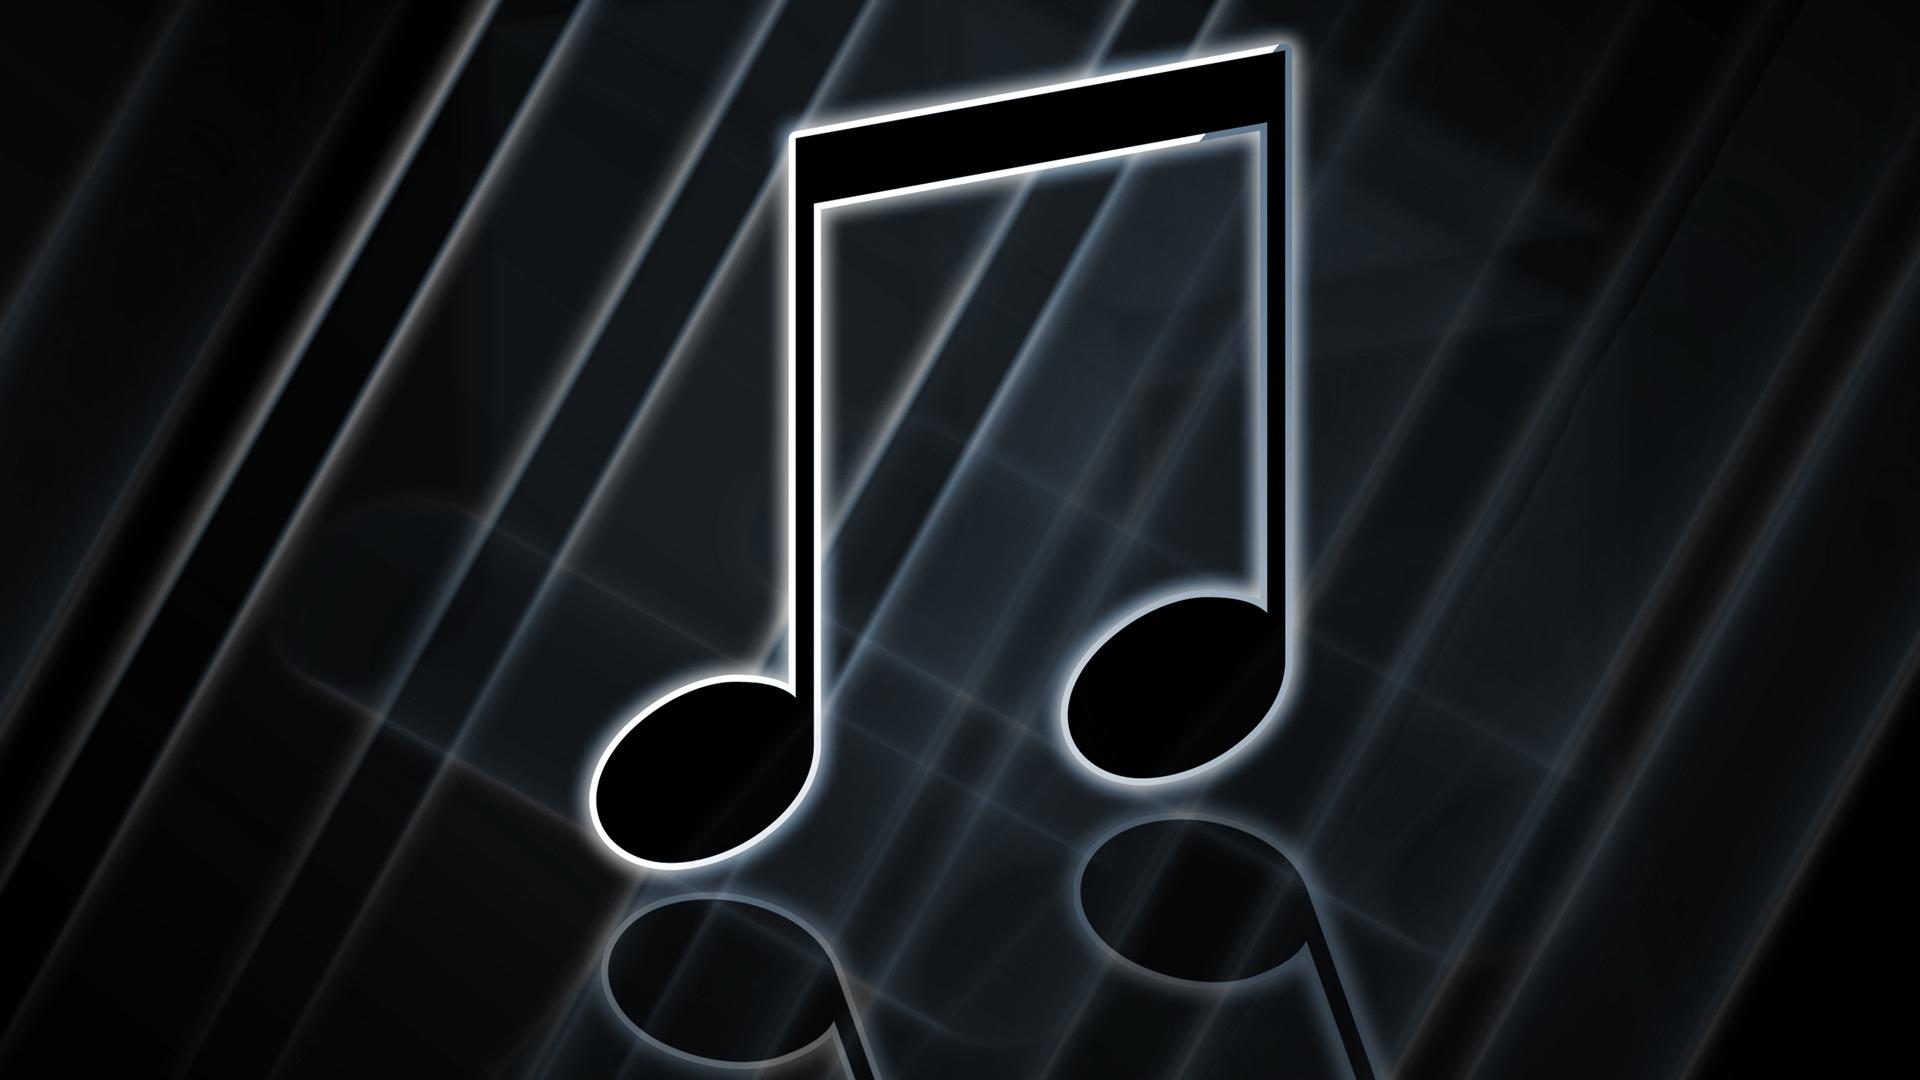 3D Music Desktop wallpaper HD Wallpapers Rocks 1920x1080